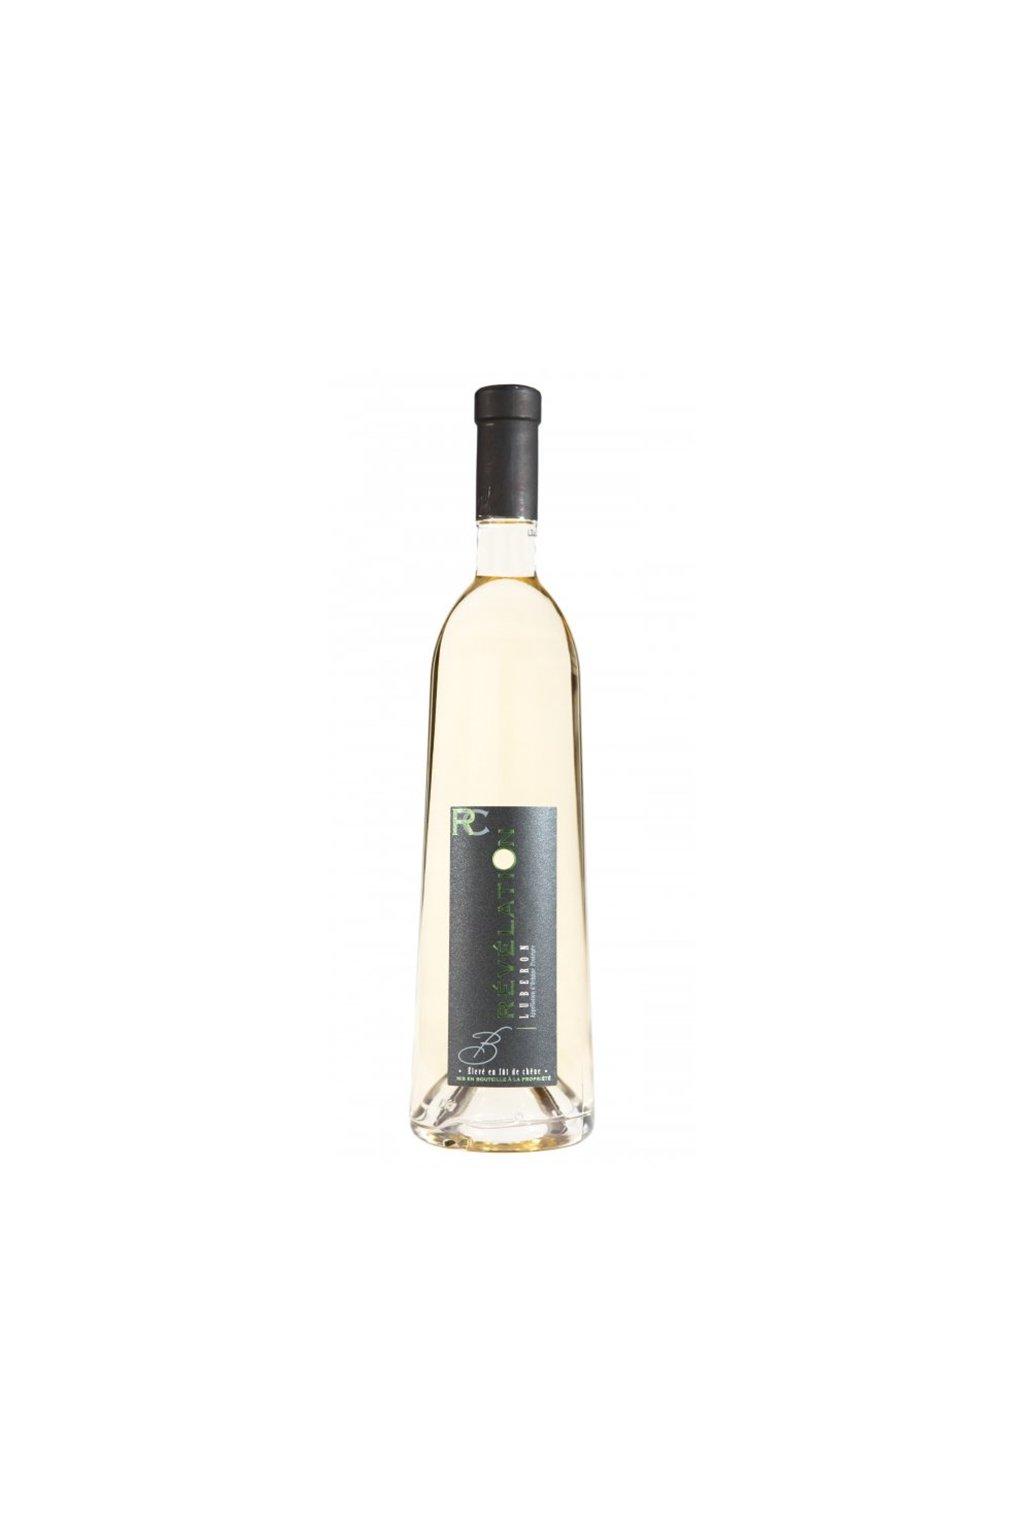 Révelation AOP Luberon Blanc